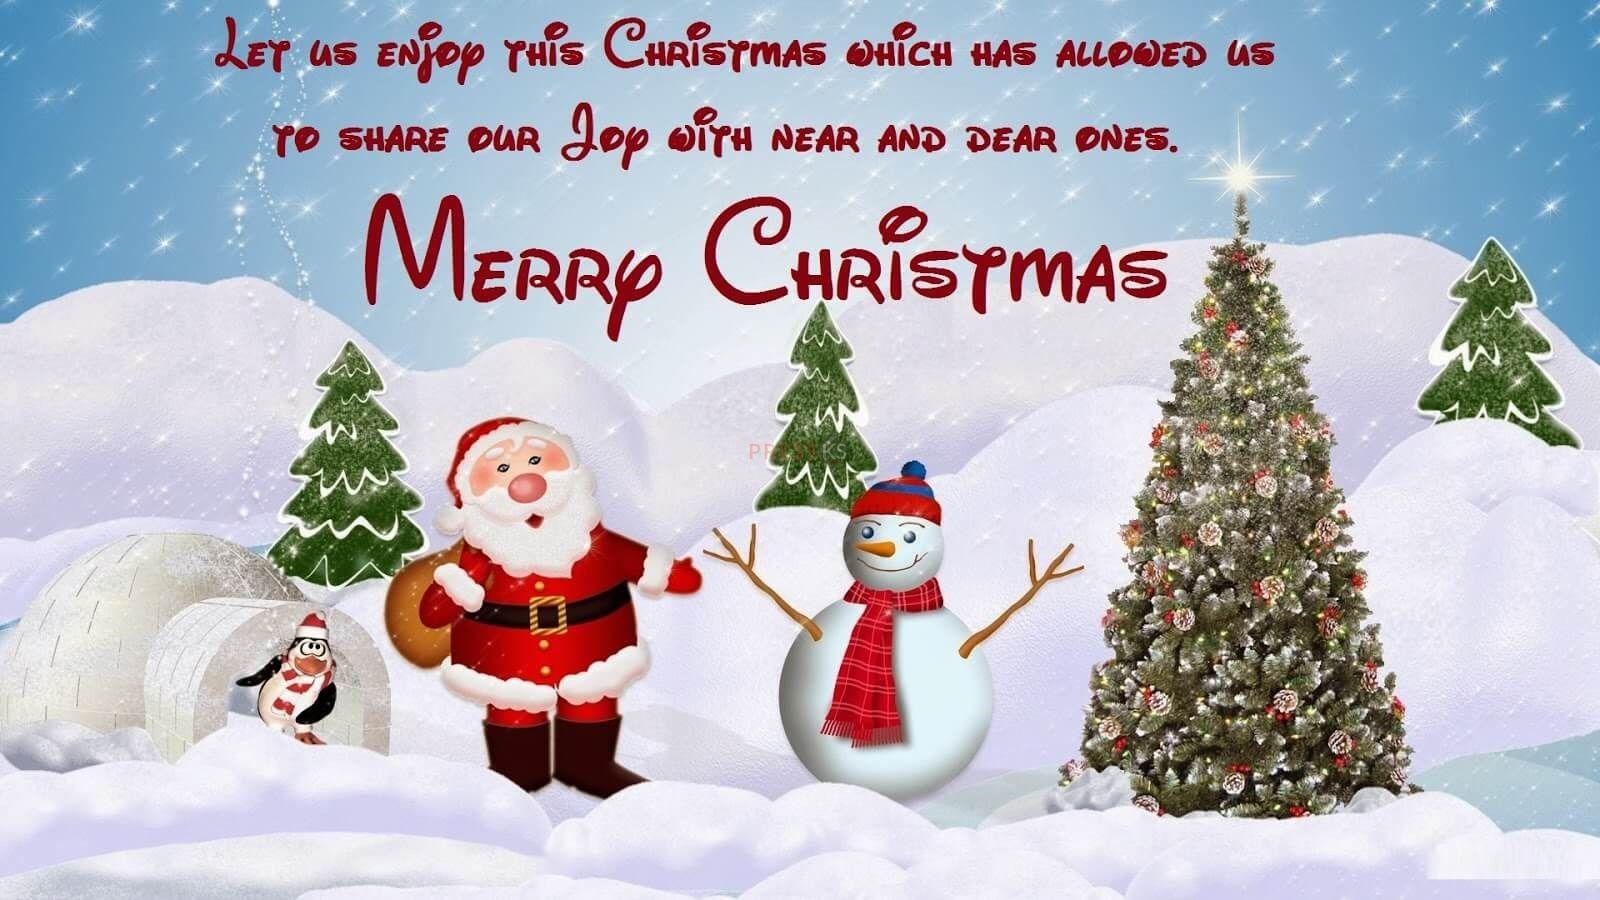 Jingle bells, jingle bells.. Jingle all the way.. Oh what fun it is ...